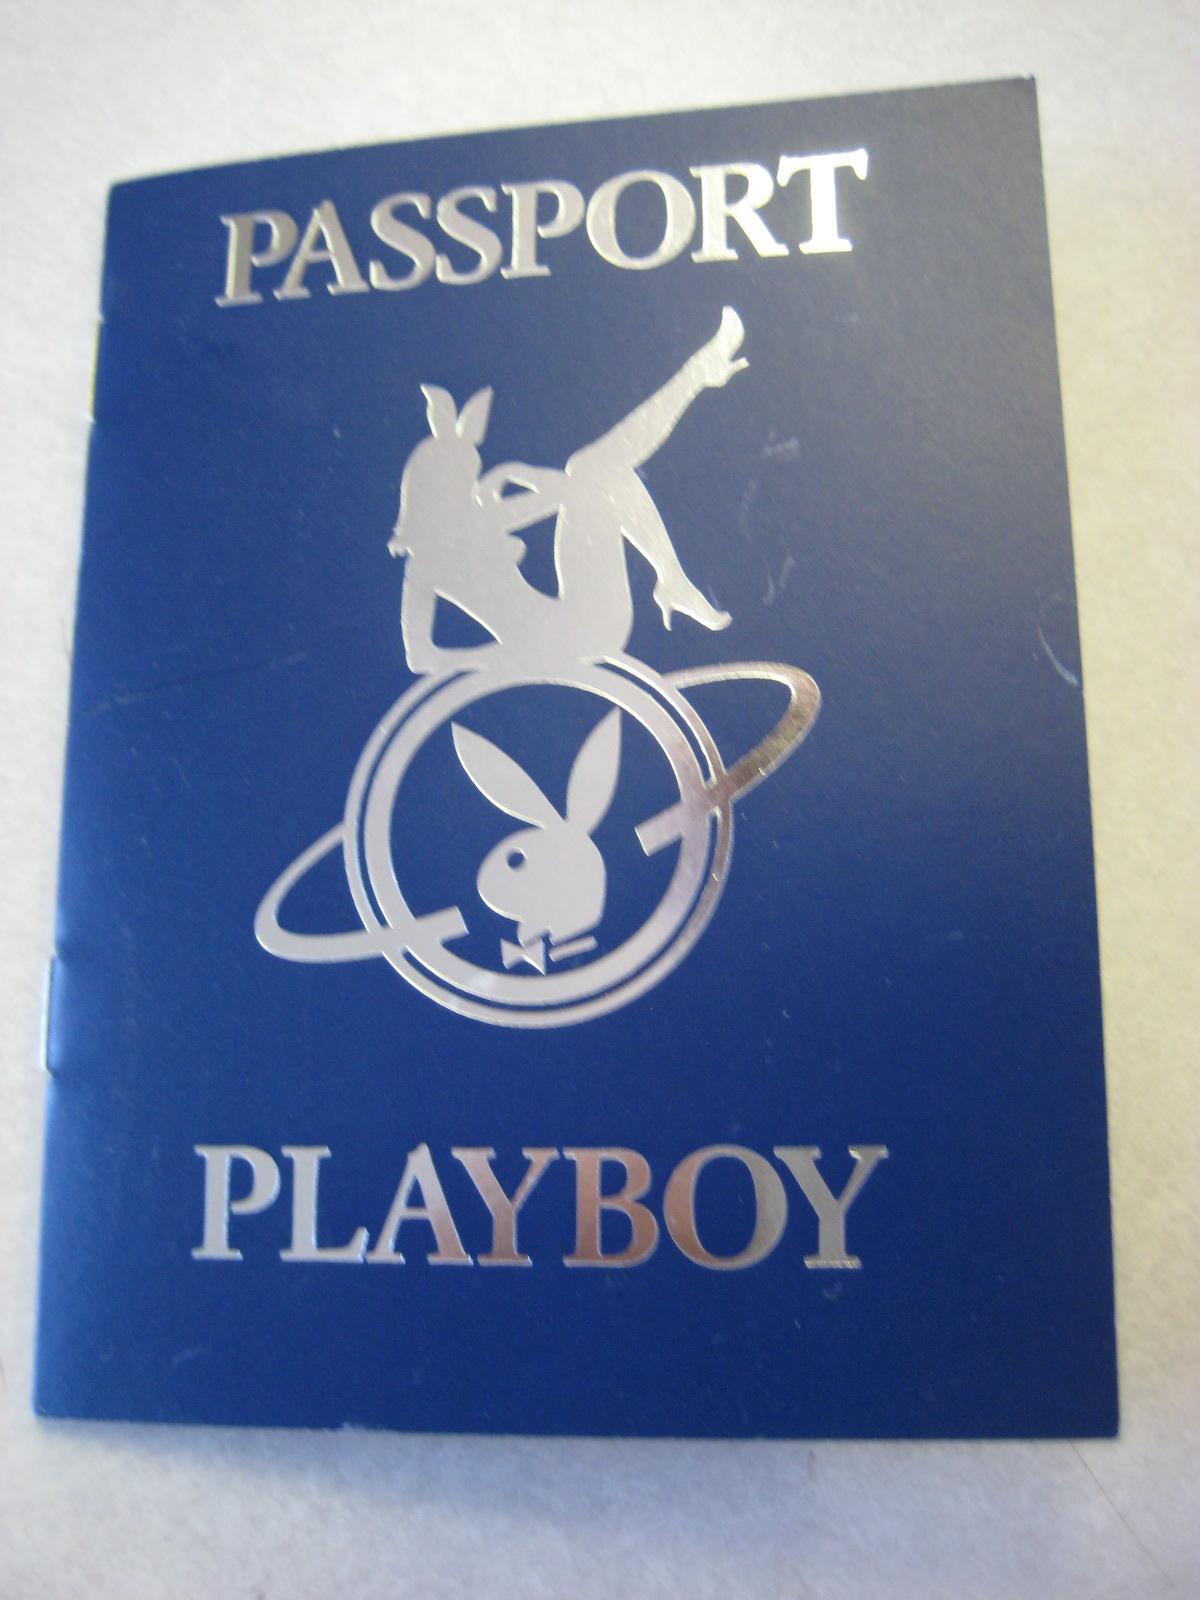 Playboy Passport